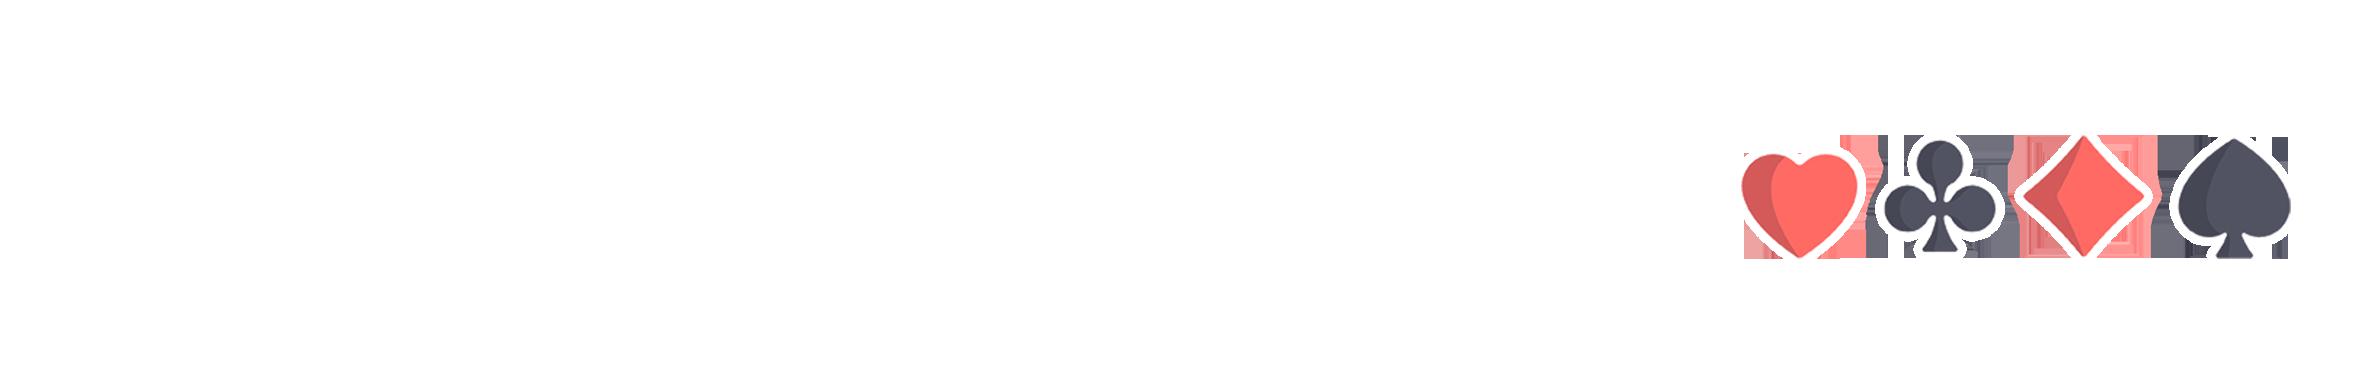 Lærtryl.dk